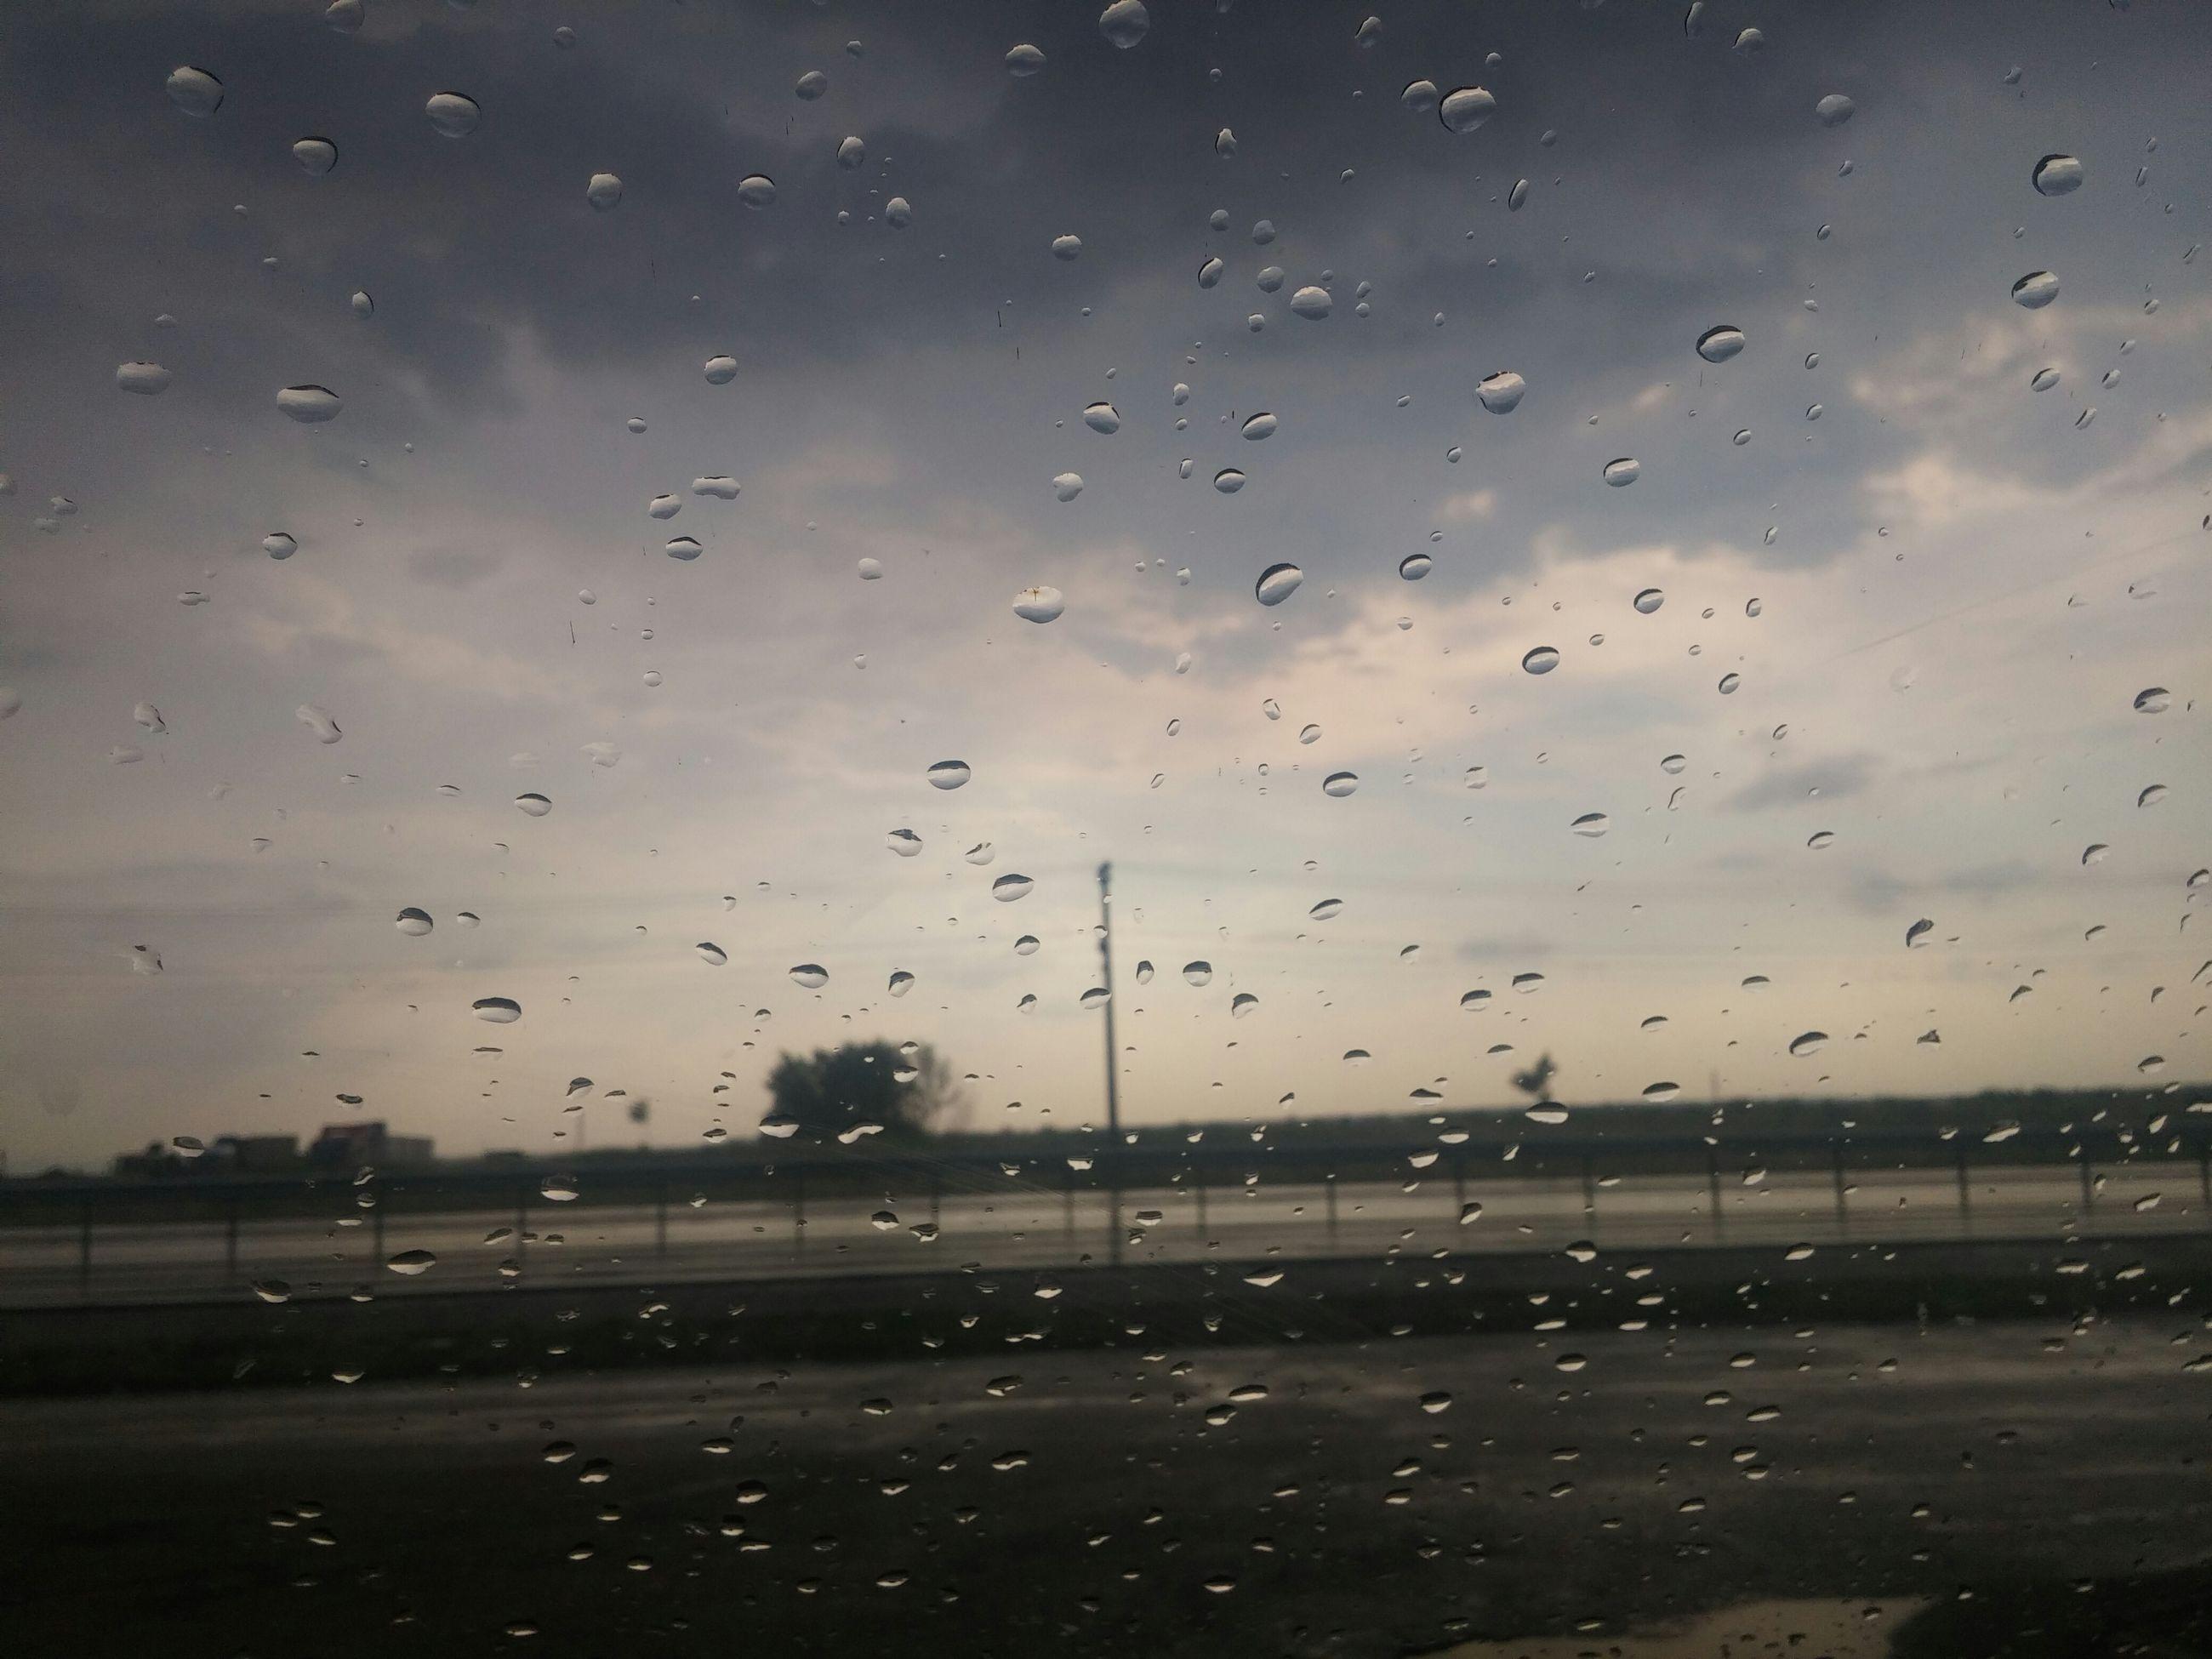 drop, wet, rain, sky, water, window, weather, raindrop, transparent, glass - material, indoors, dusk, cloud - sky, silhouette, glass, monsoon, season, nature, overcast, focus on foreground